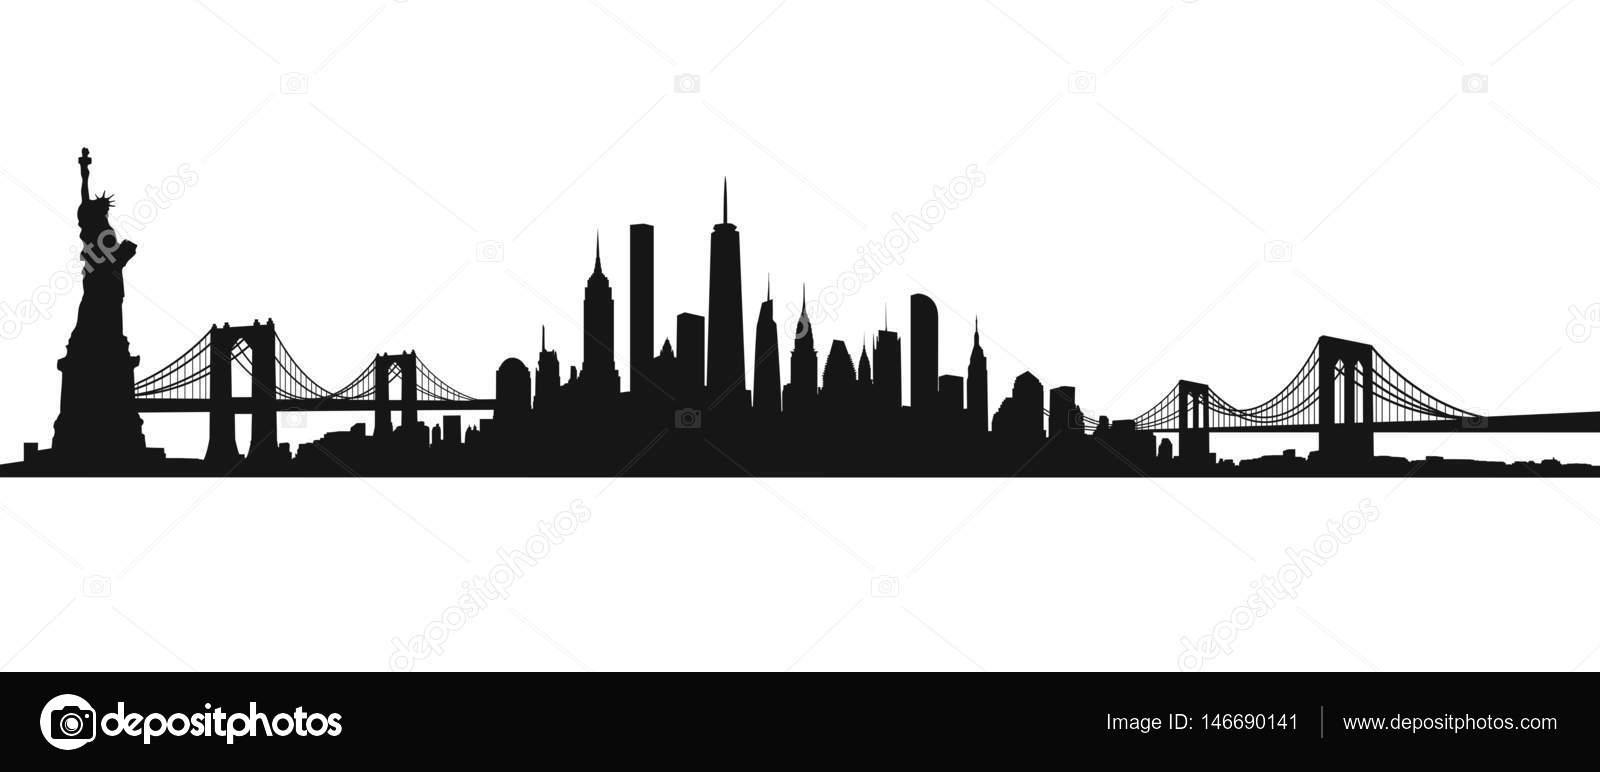 new york city skyline vector stock vector tangducminh 146690141 rh depositphotos com new york city skyline vector new york skyline vector image